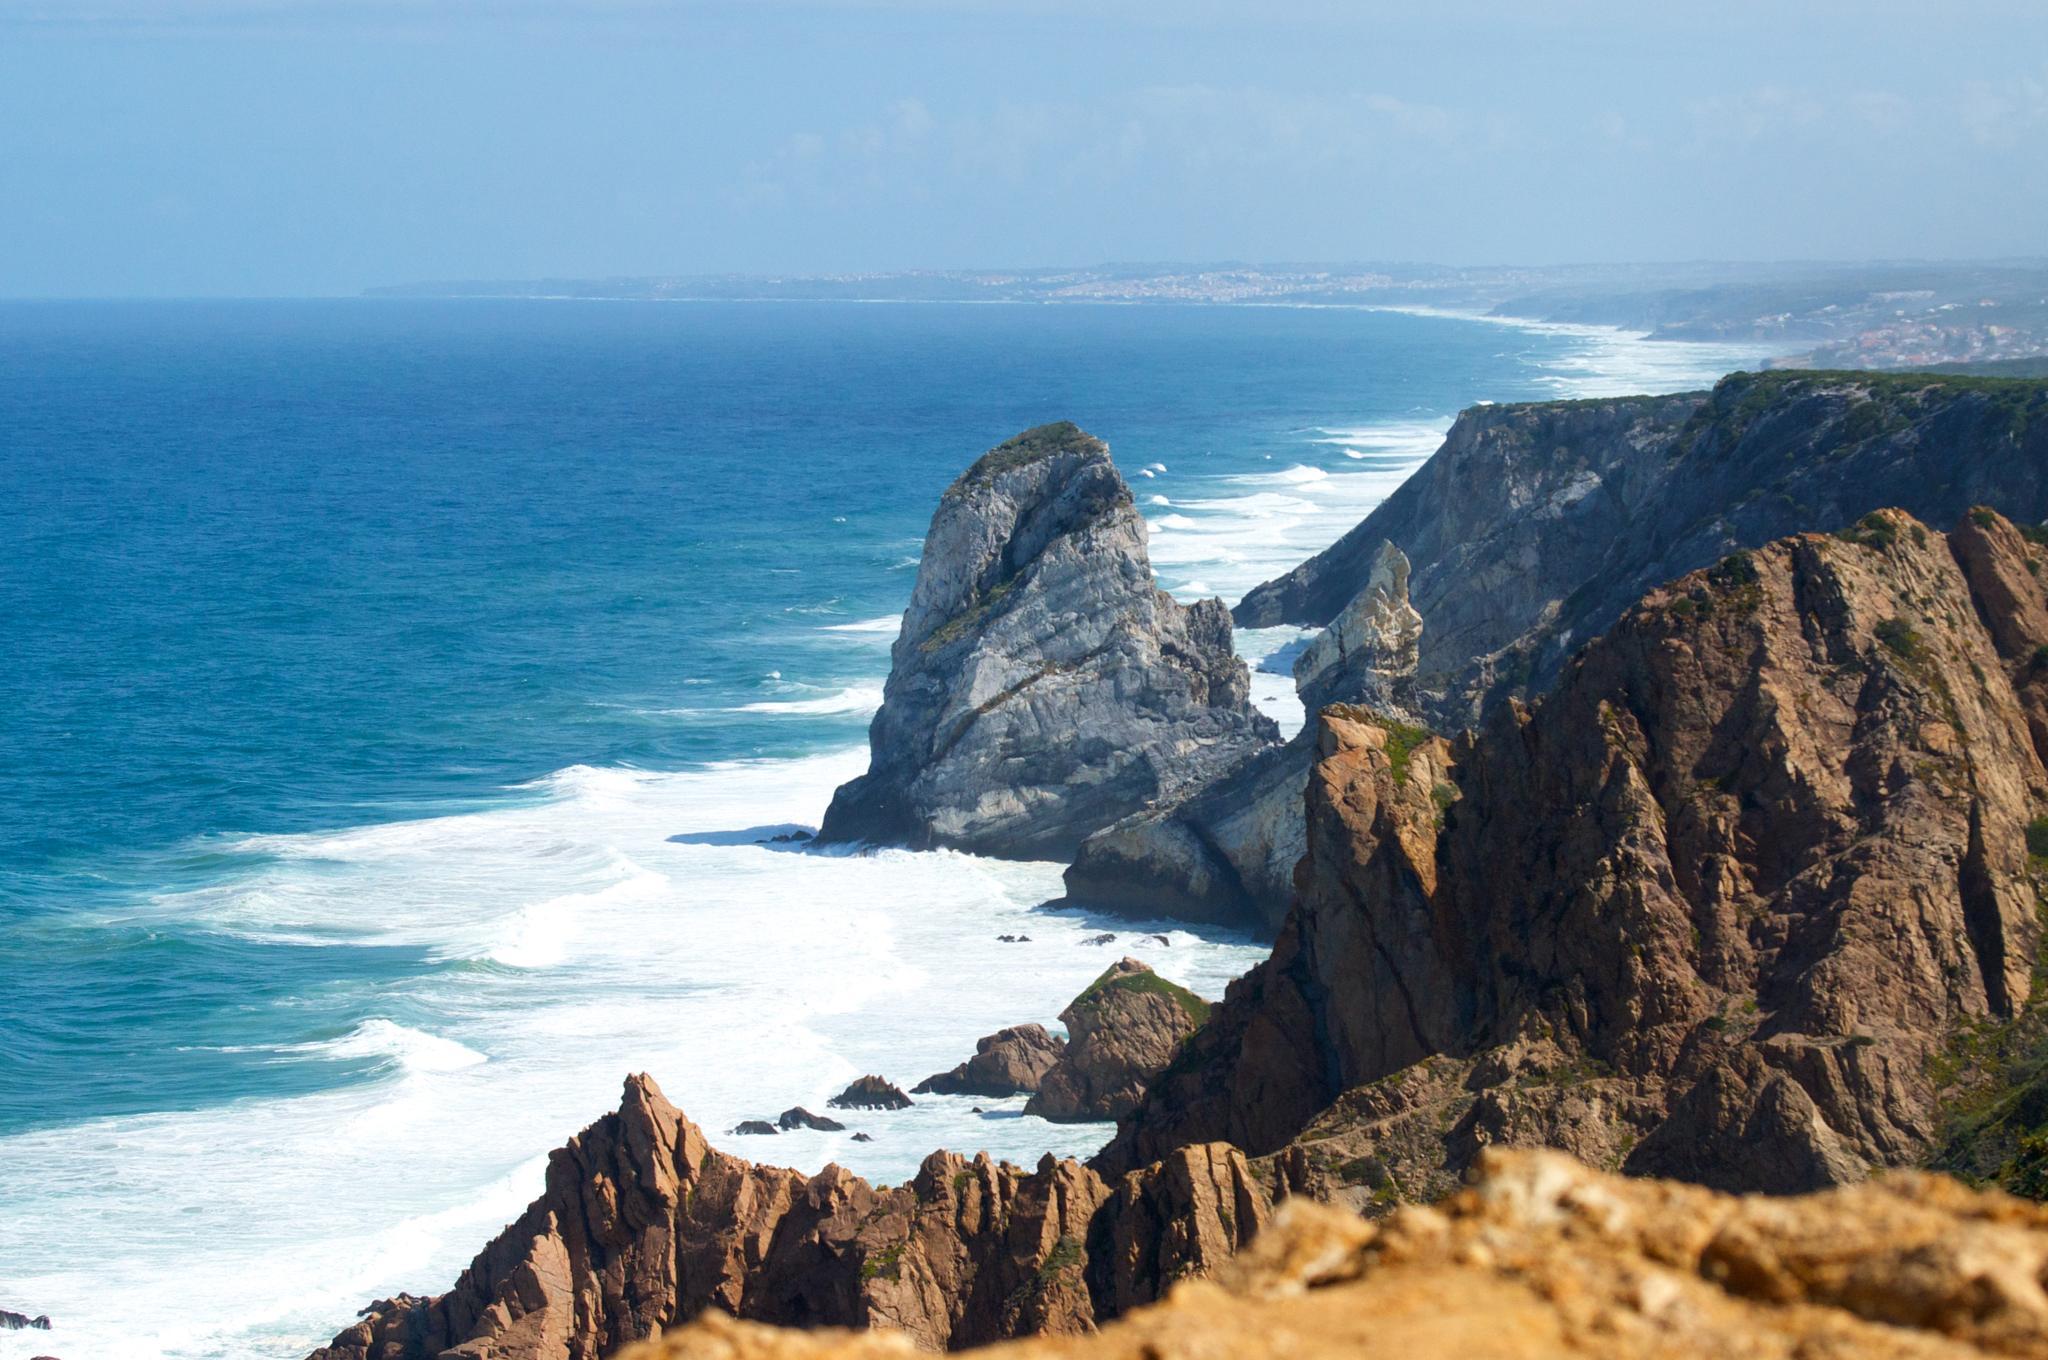 Cape Rock by Grégory Hallé Petiot